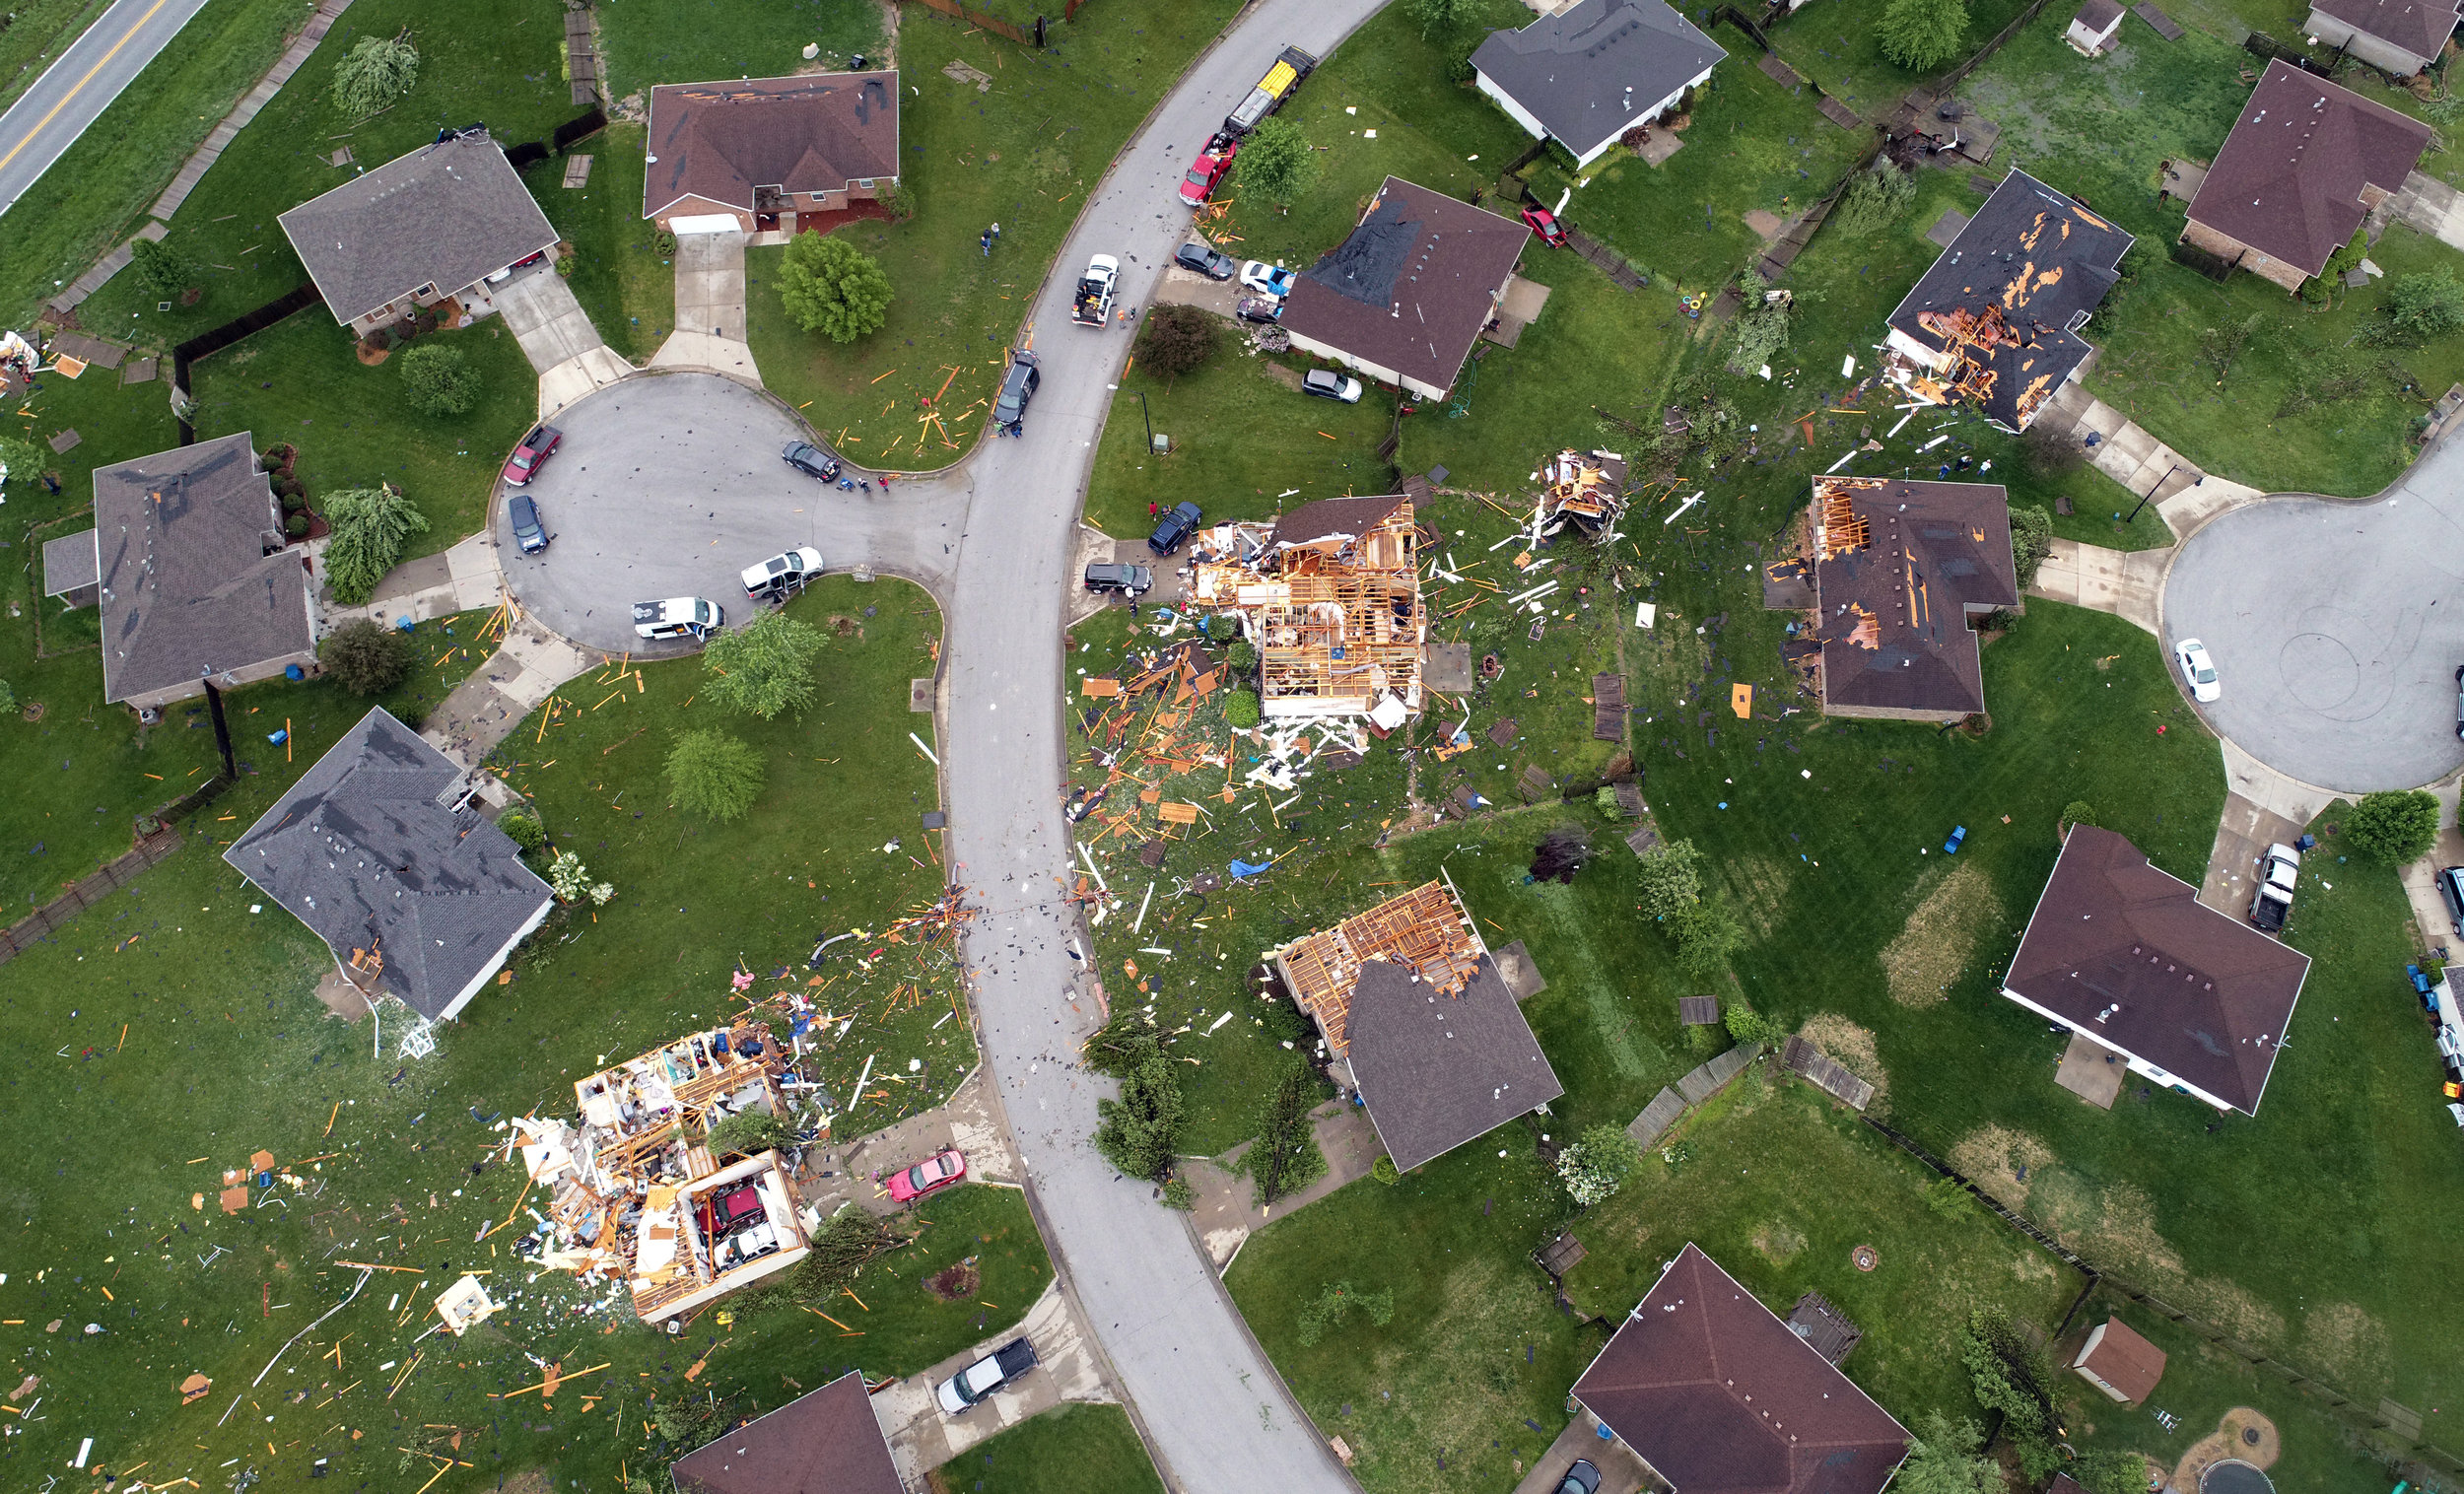 Tornado Damage in Ozark, Missouri. May 2019